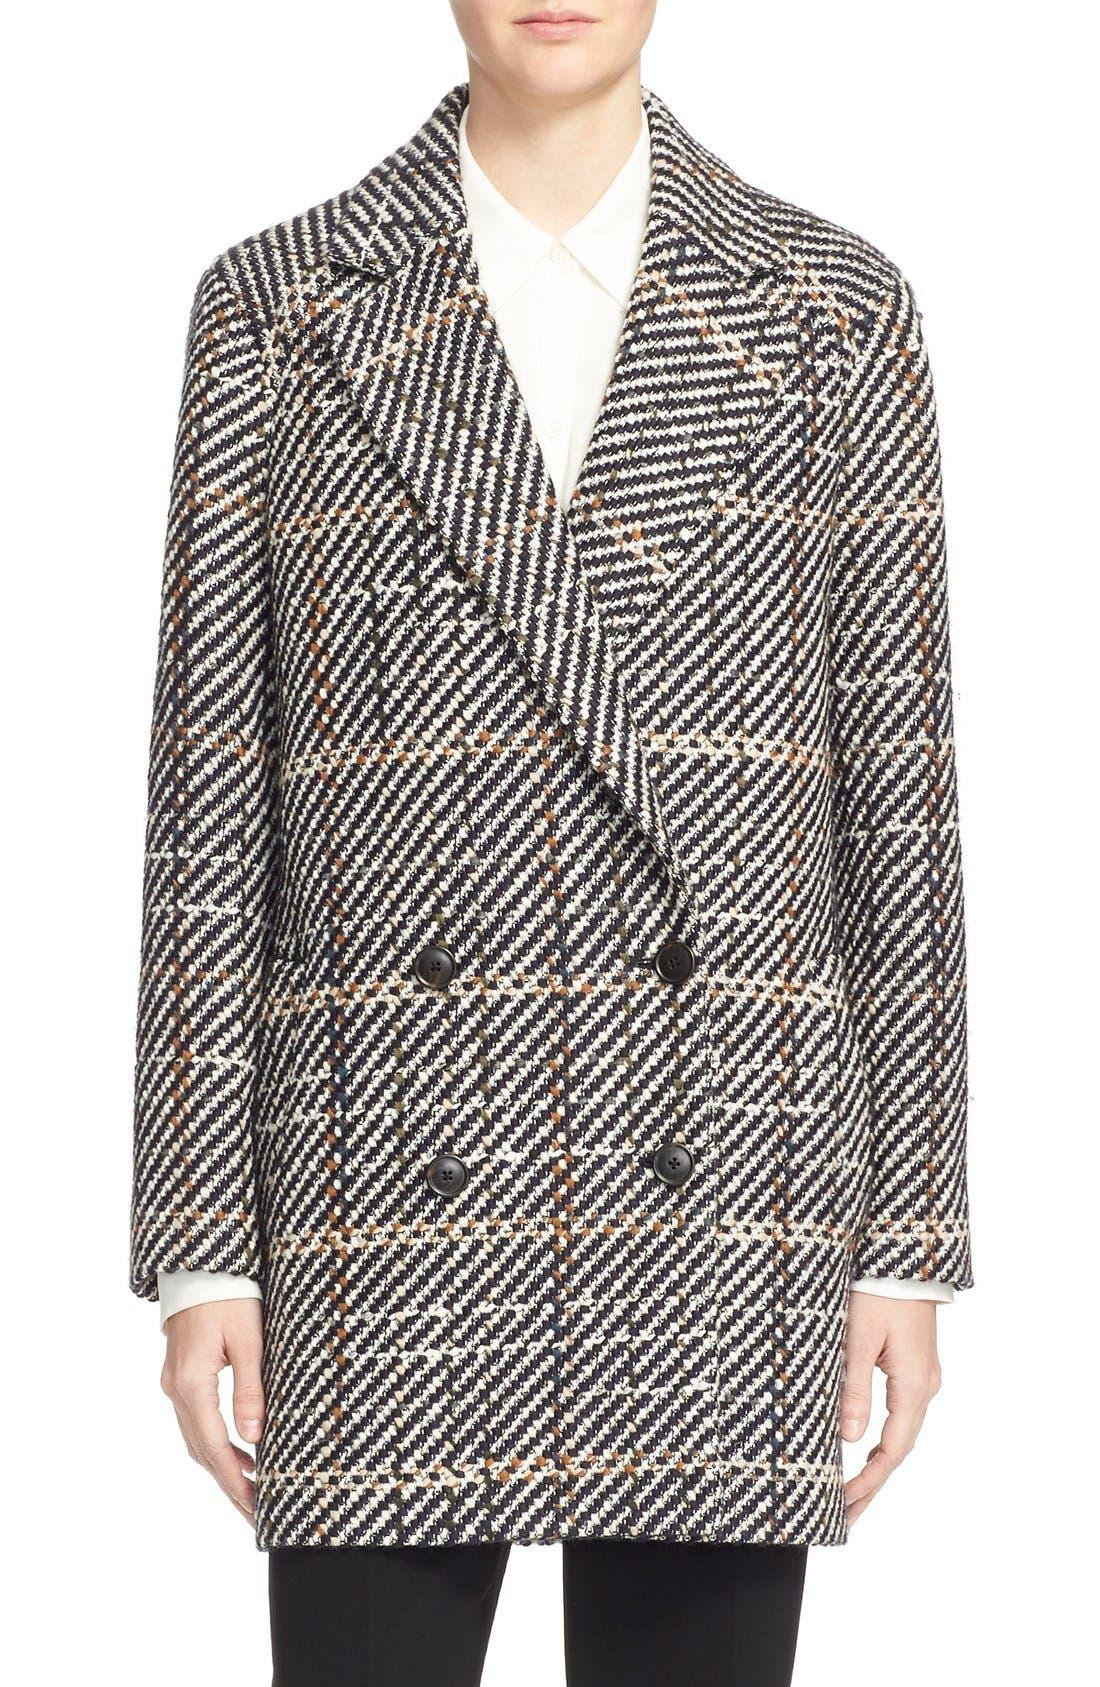 THEORY, Graphic Tweed Coat, Main thumbnail 1, color, 454